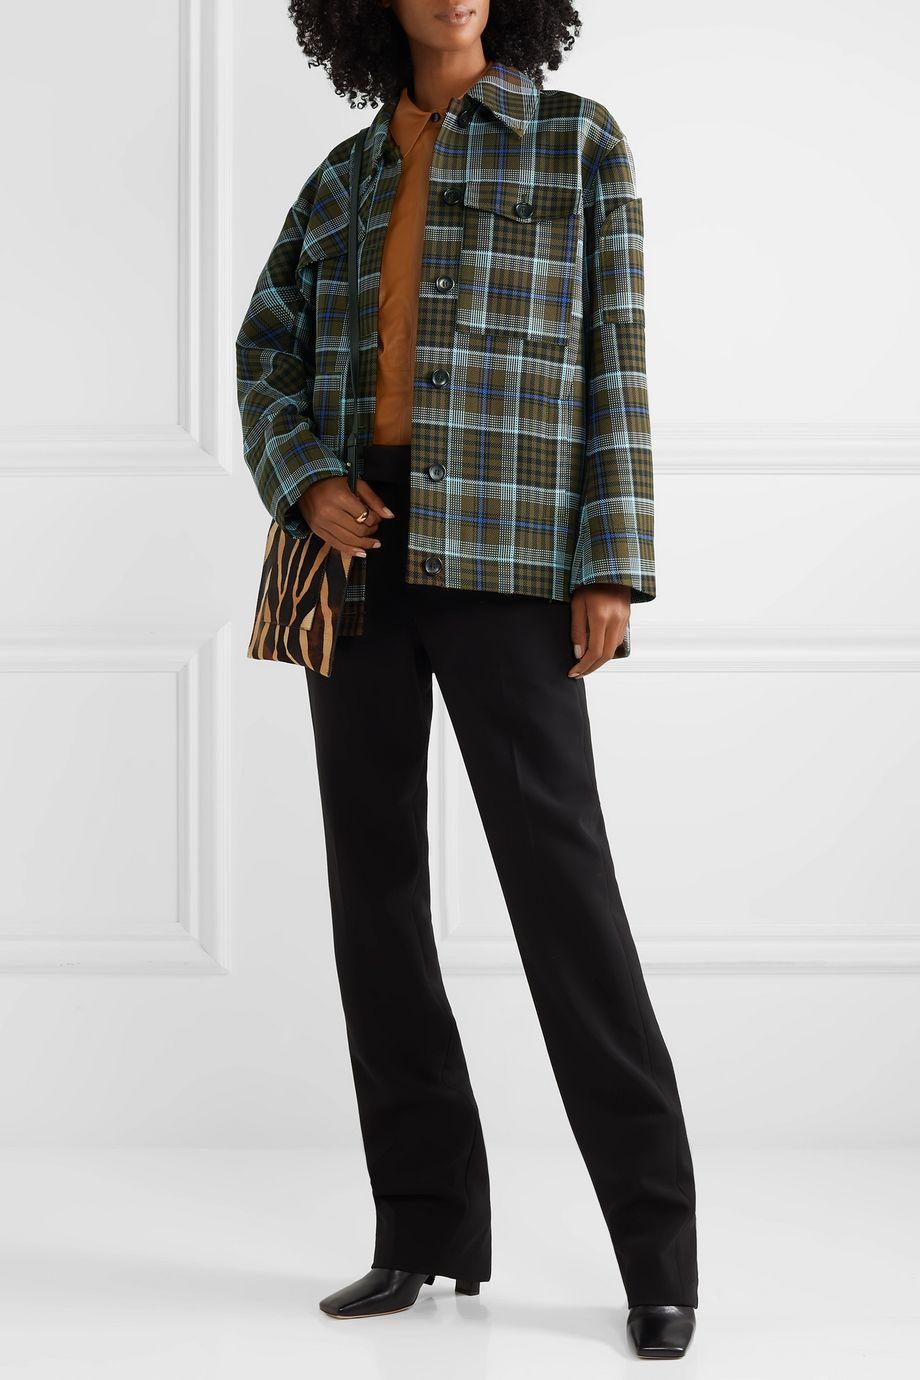 Tibi Spencer checked woven jacket